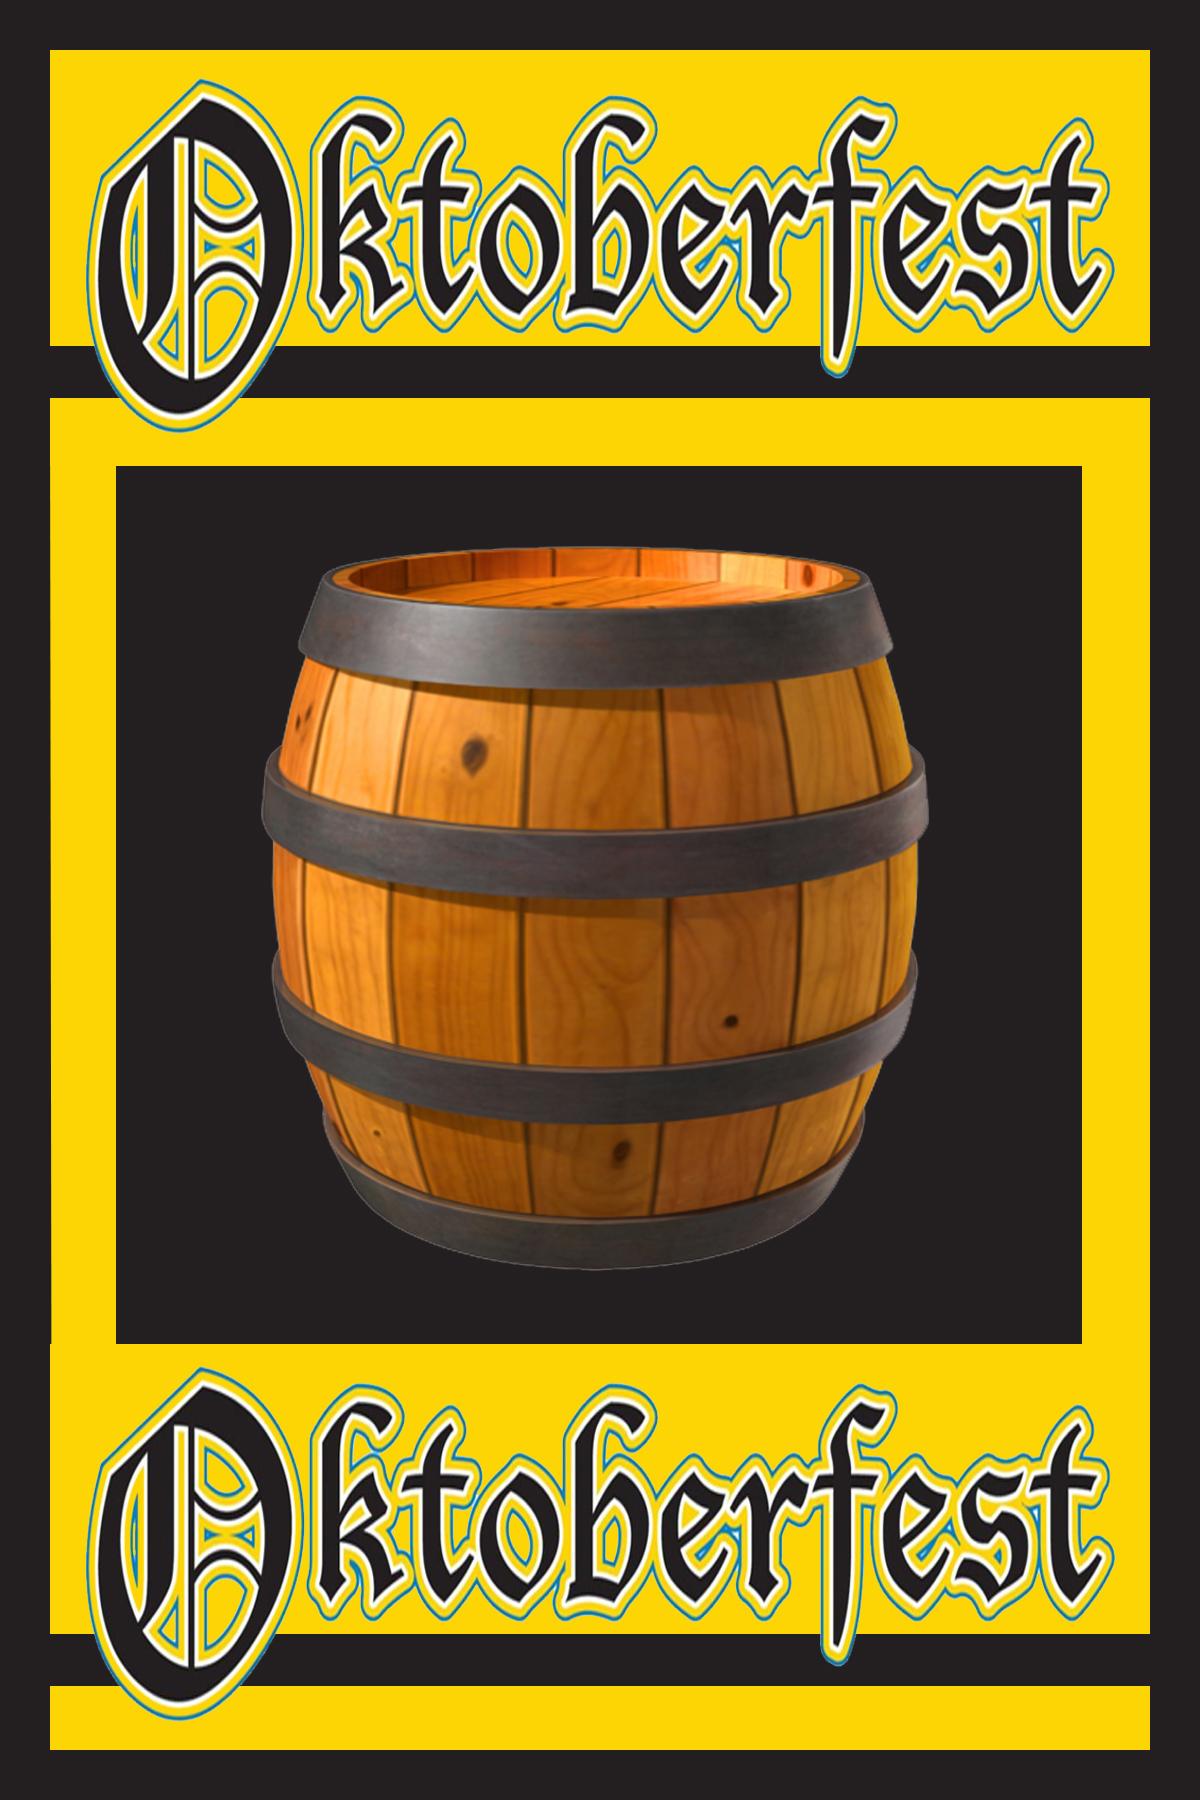 Oktoberfest Banner 3 Beer Barrel.jpg